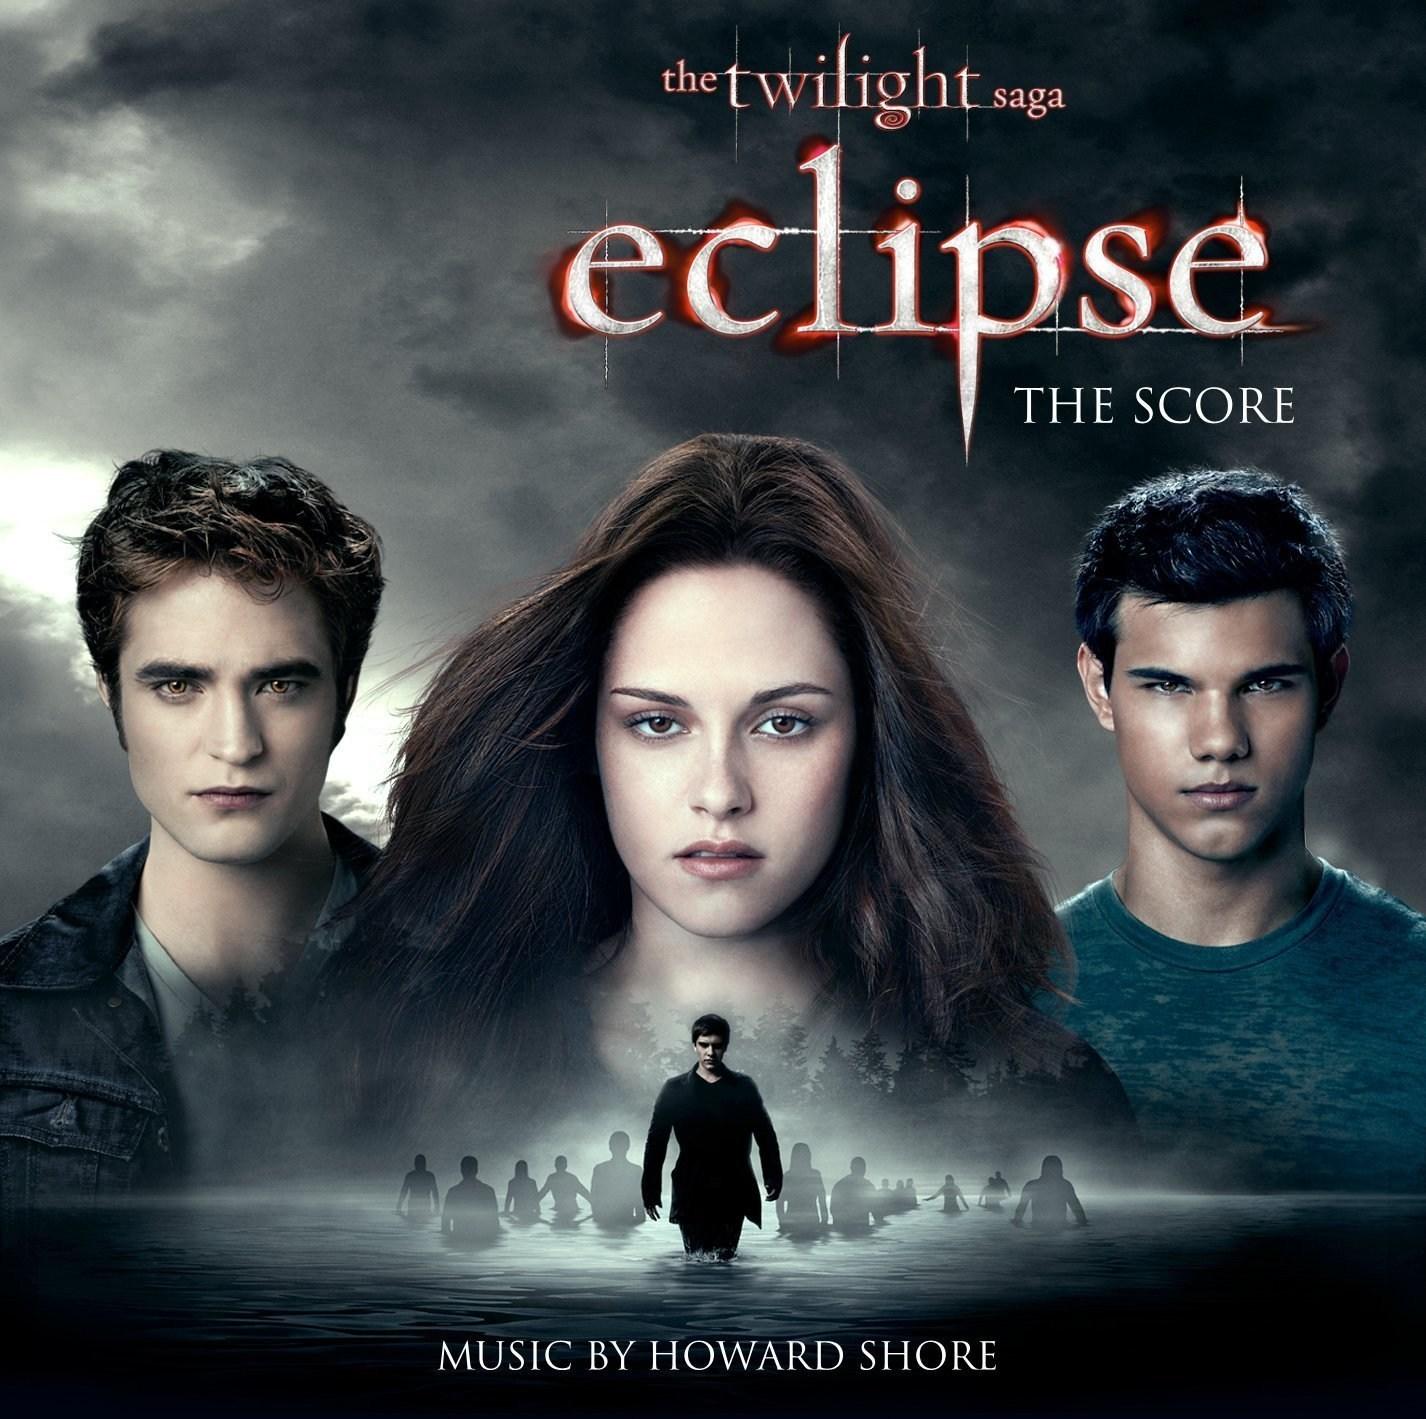 twilight saga movie soundtracks images the twilight saga